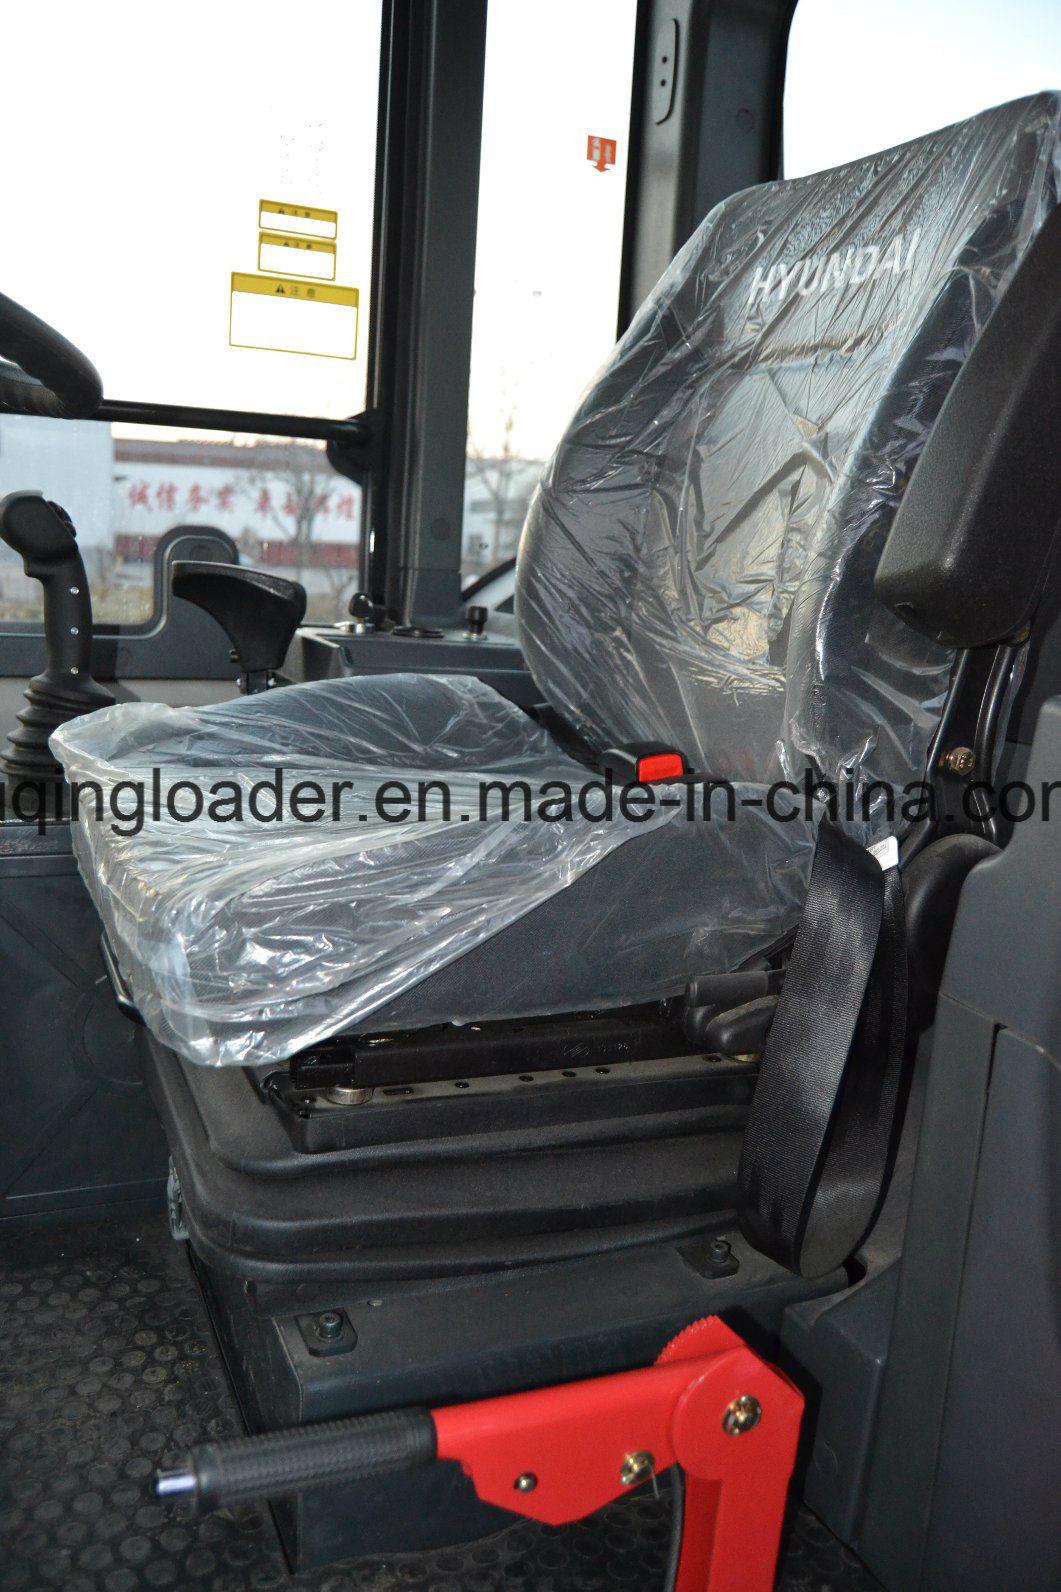 Hyundai Wheel Loader Spare Parts Original Supplier with Good Quality